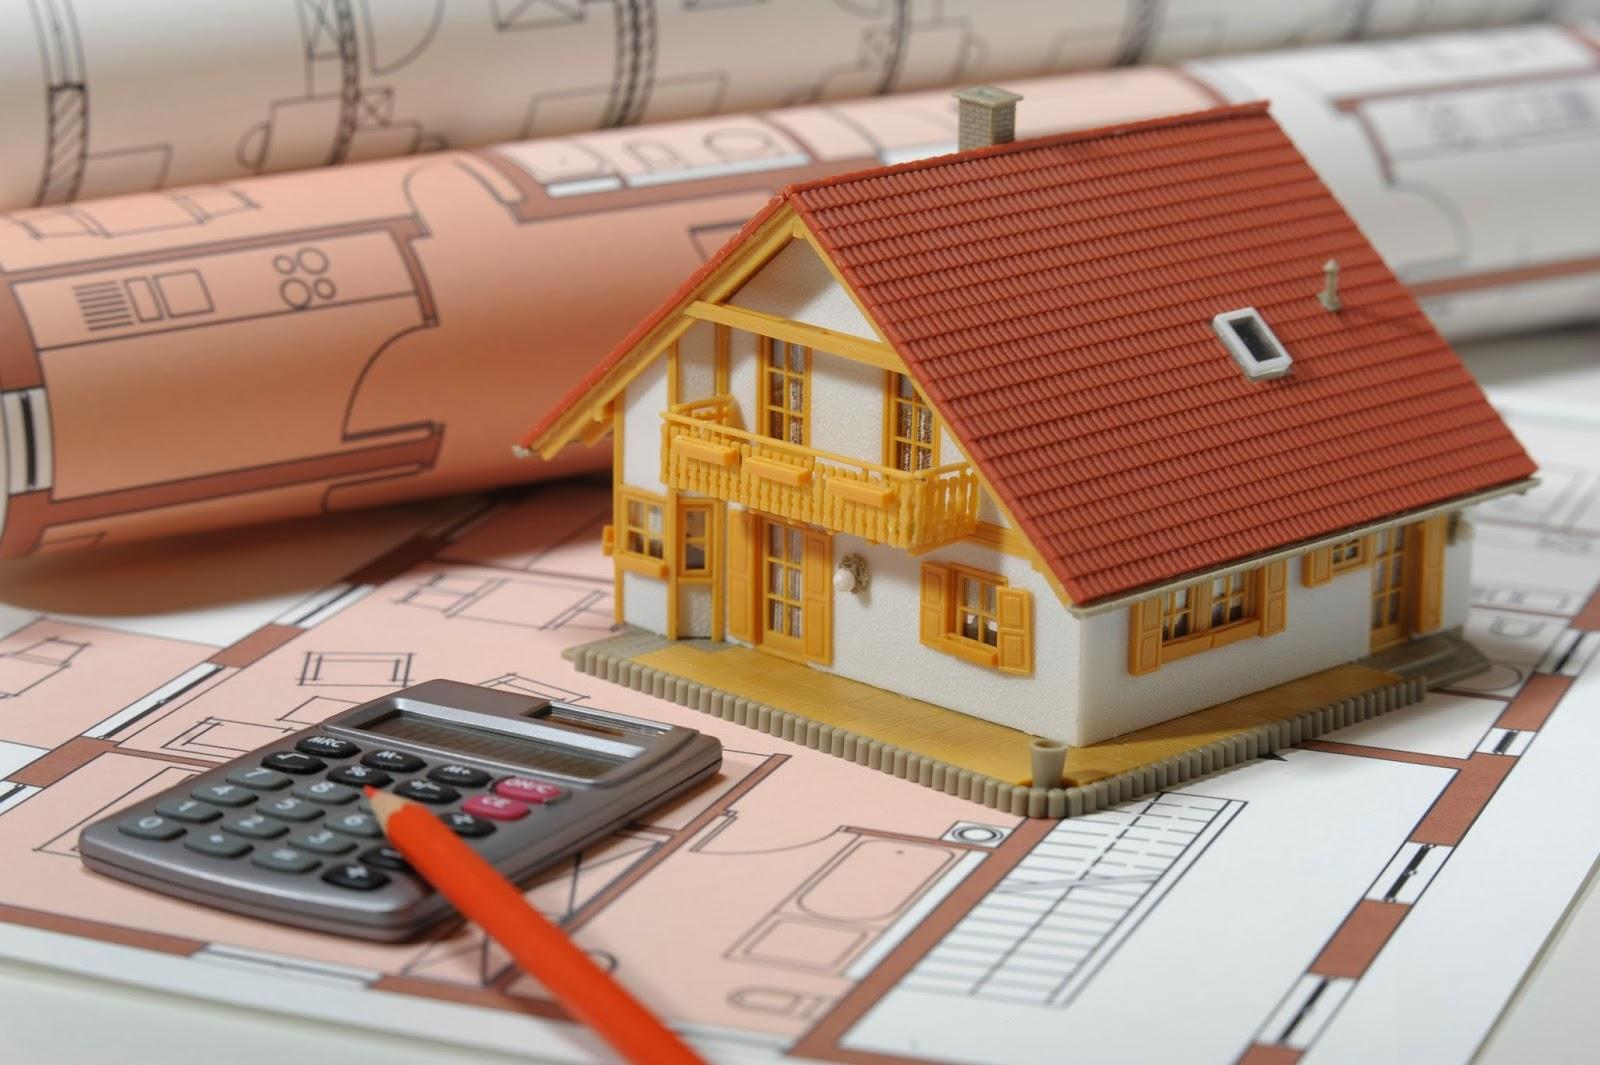 Panduan Jual Beli Hartanah : Persediaan sebelum membeli rumah